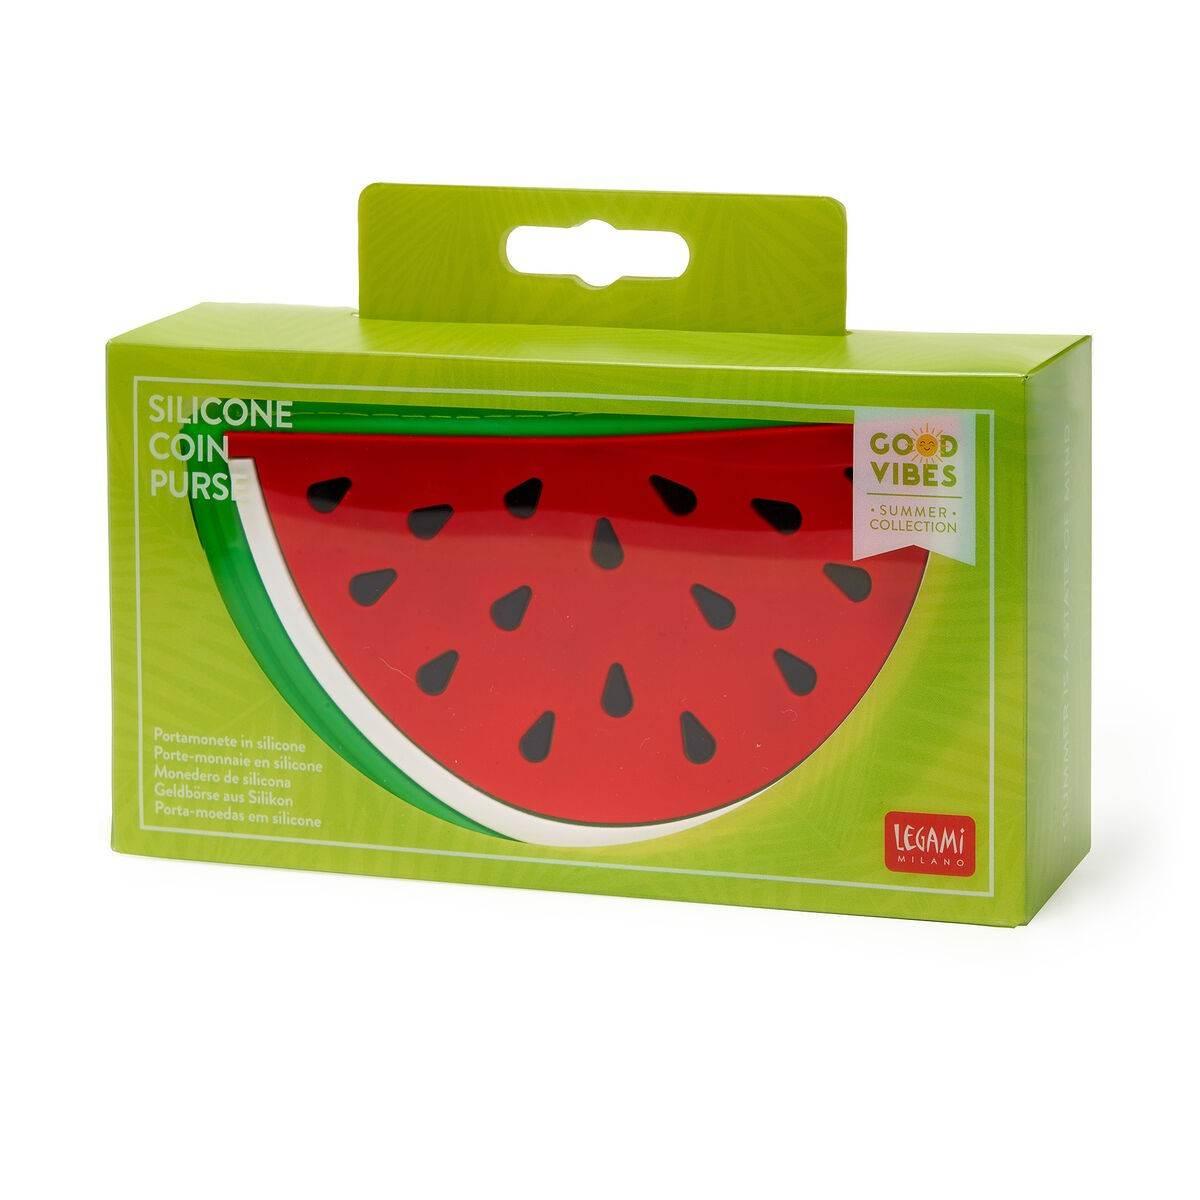 Legami VSP0002 Πορτοφόλι Σιλικόνης - Watermelon Red/Green